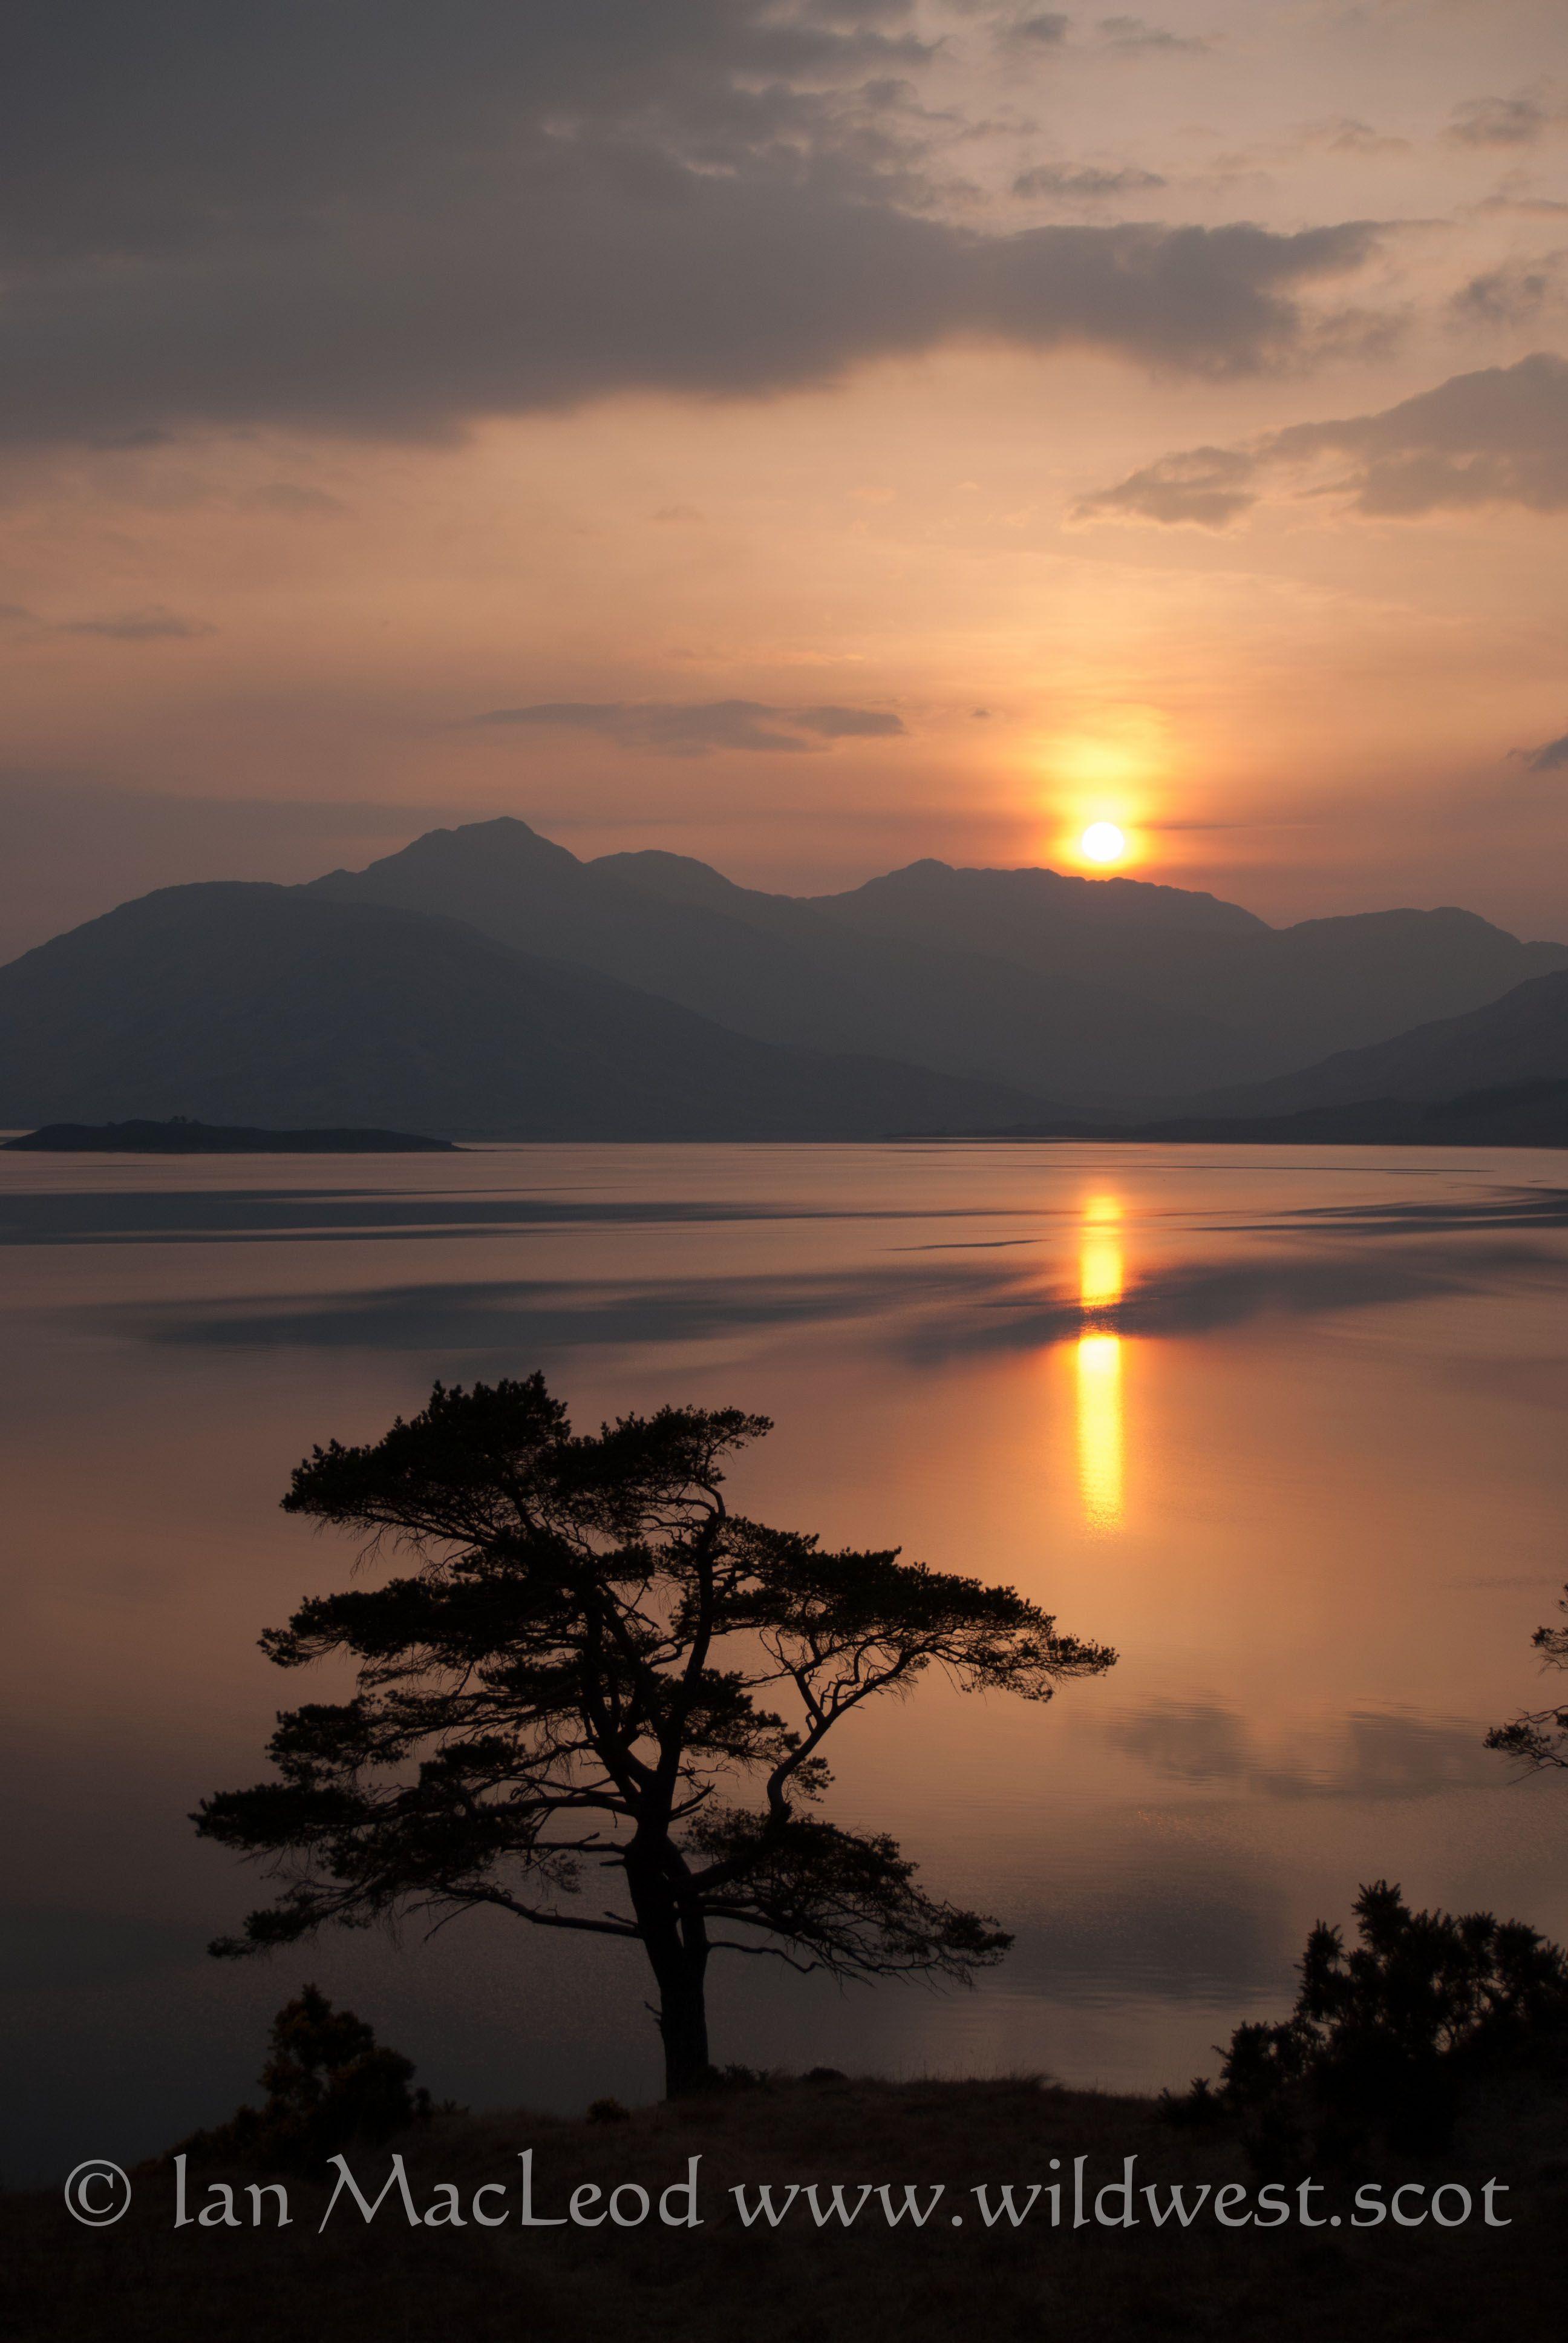 Sunset on Loch Quoich, Glengarry